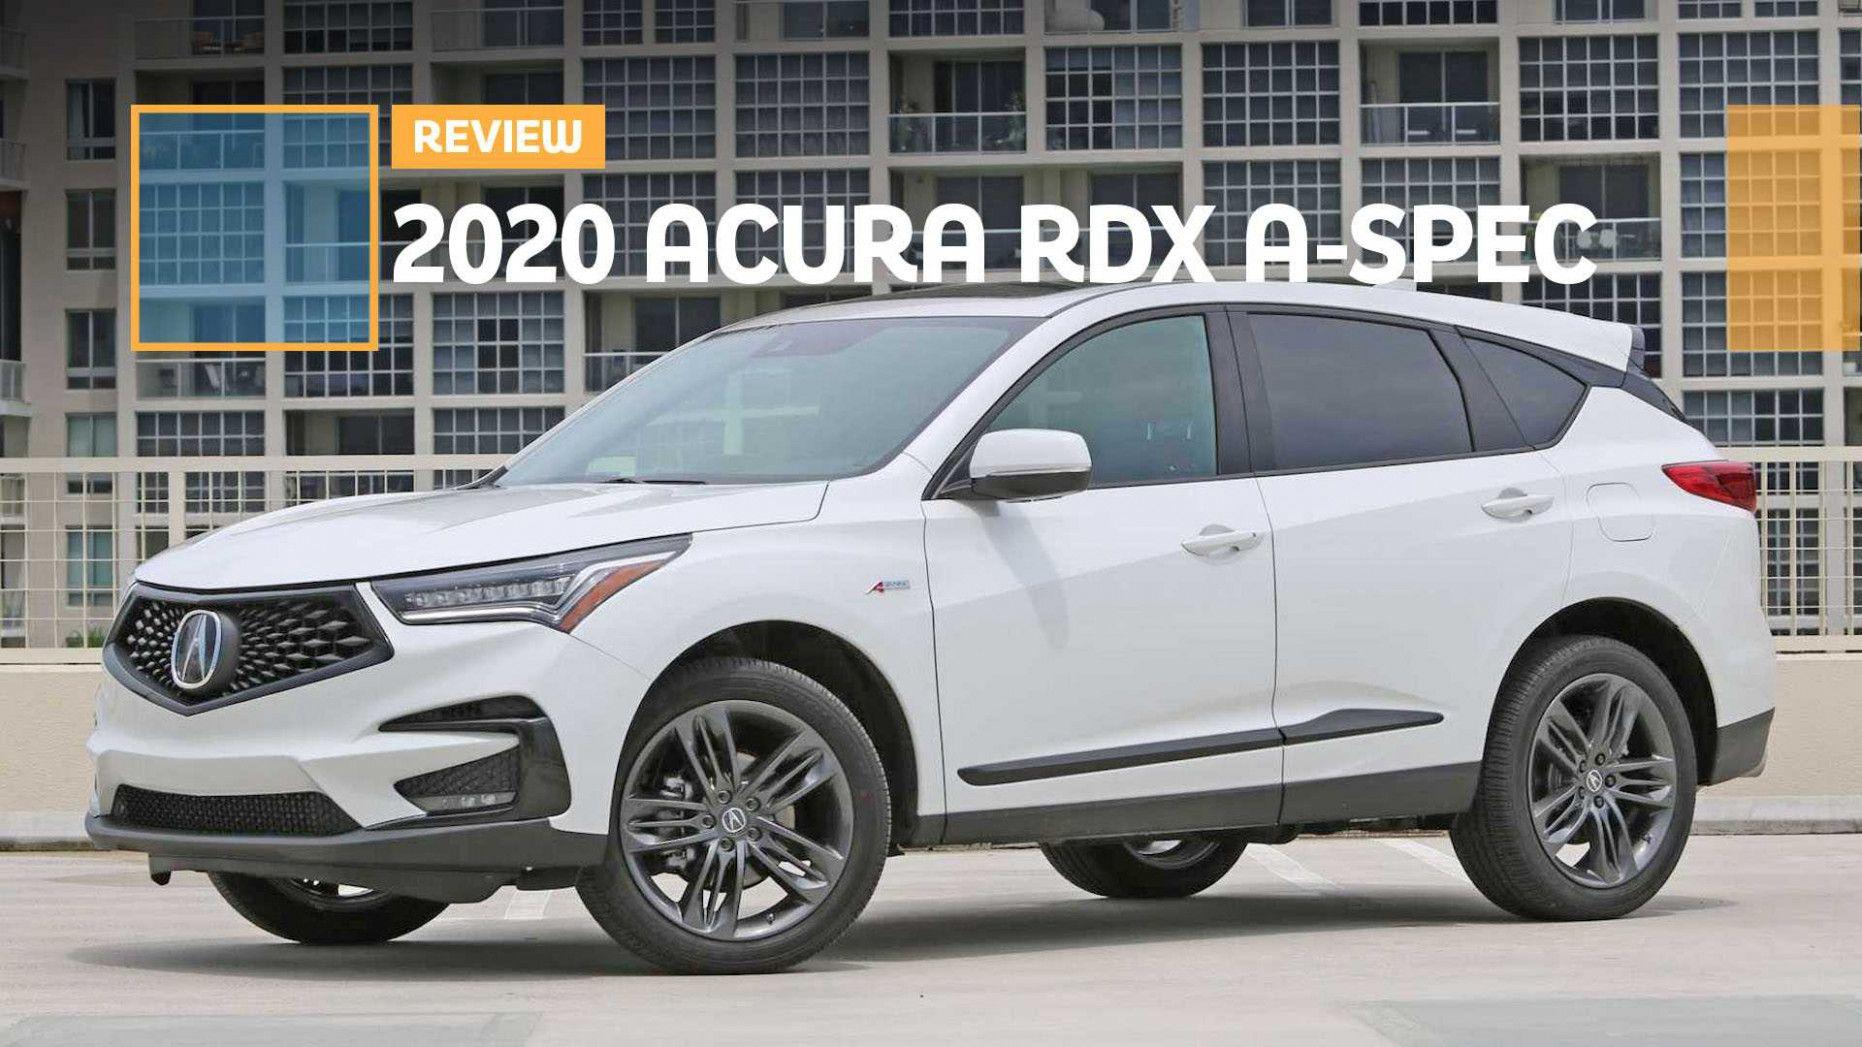 Acura Mdx 2020 Redesign Acura Mdx Acura Mdx Hybrid Acura Rdx